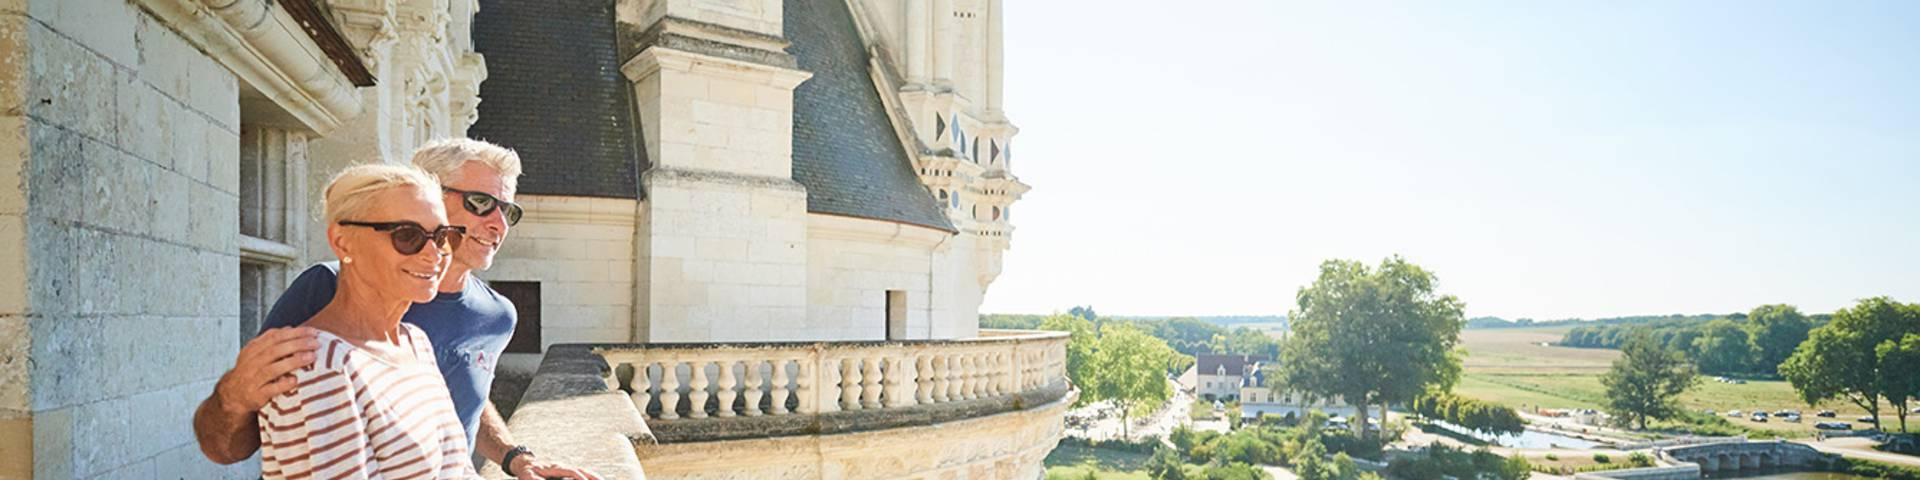 The terraces of Chambord_ Crédit Benjamin Brolet